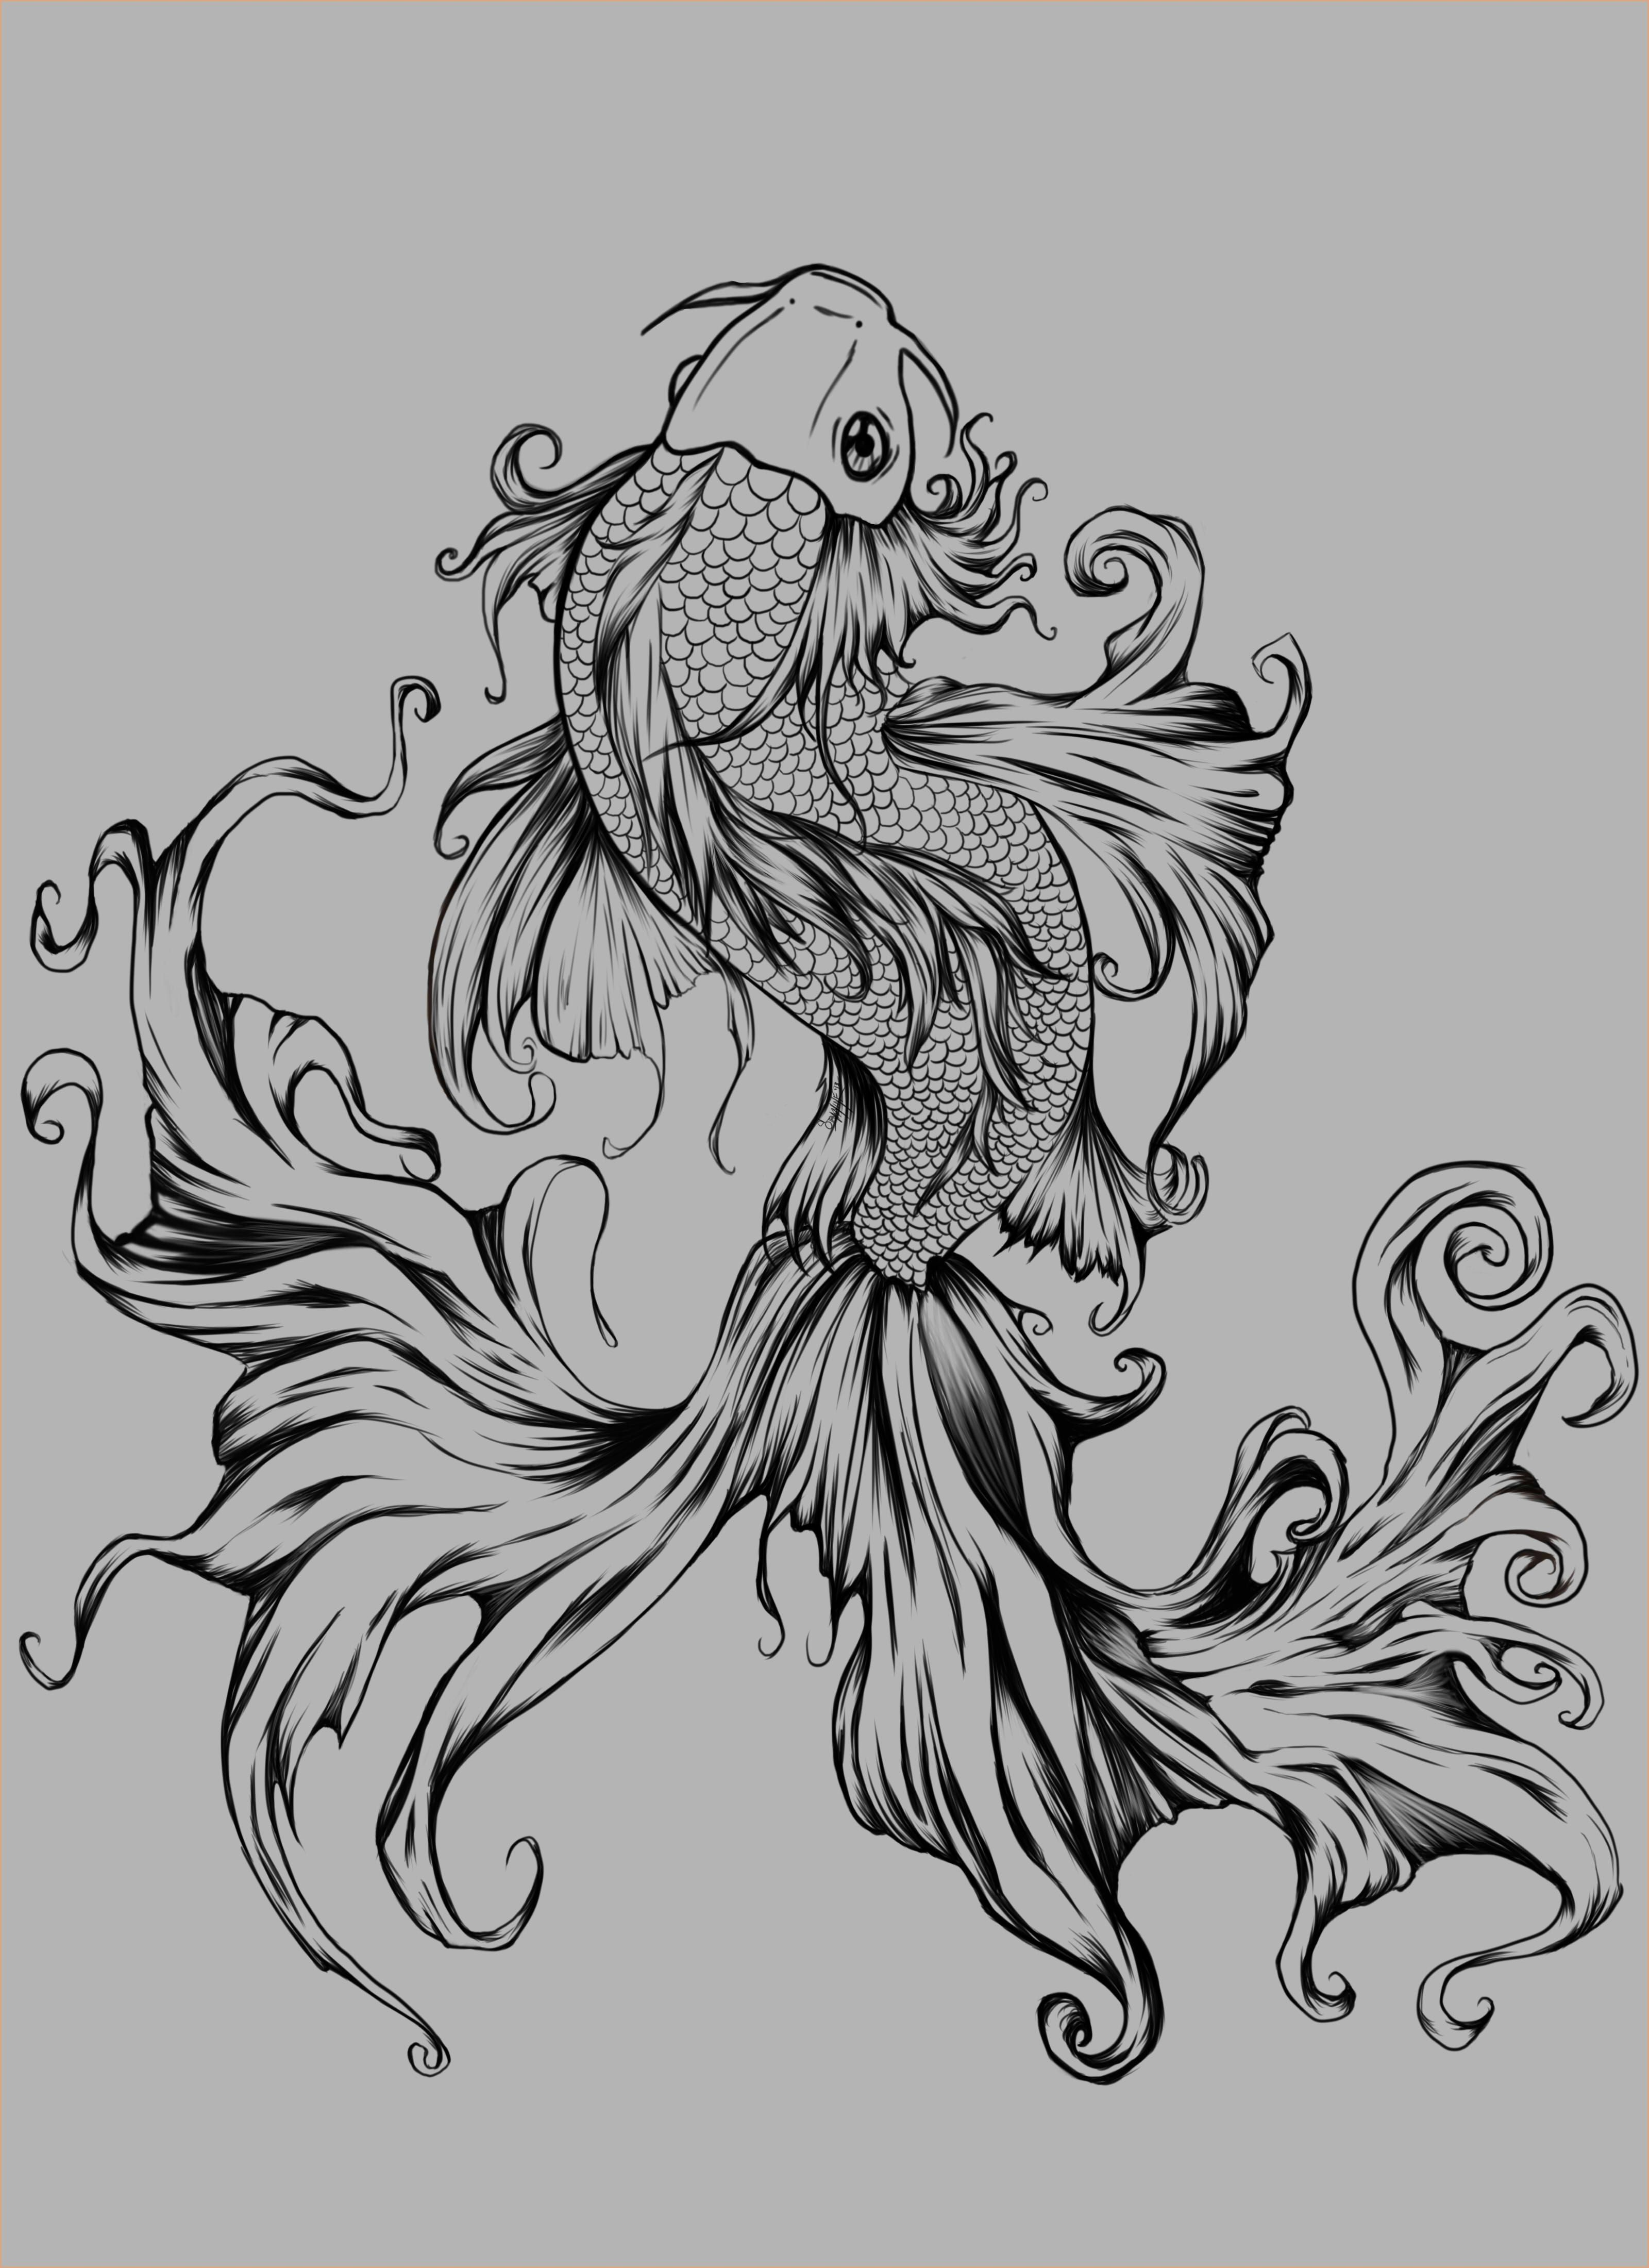 Black And White Beta Fish Tattoo Google Search Koi Fish Tattoo Fish Tattoos Tattoos